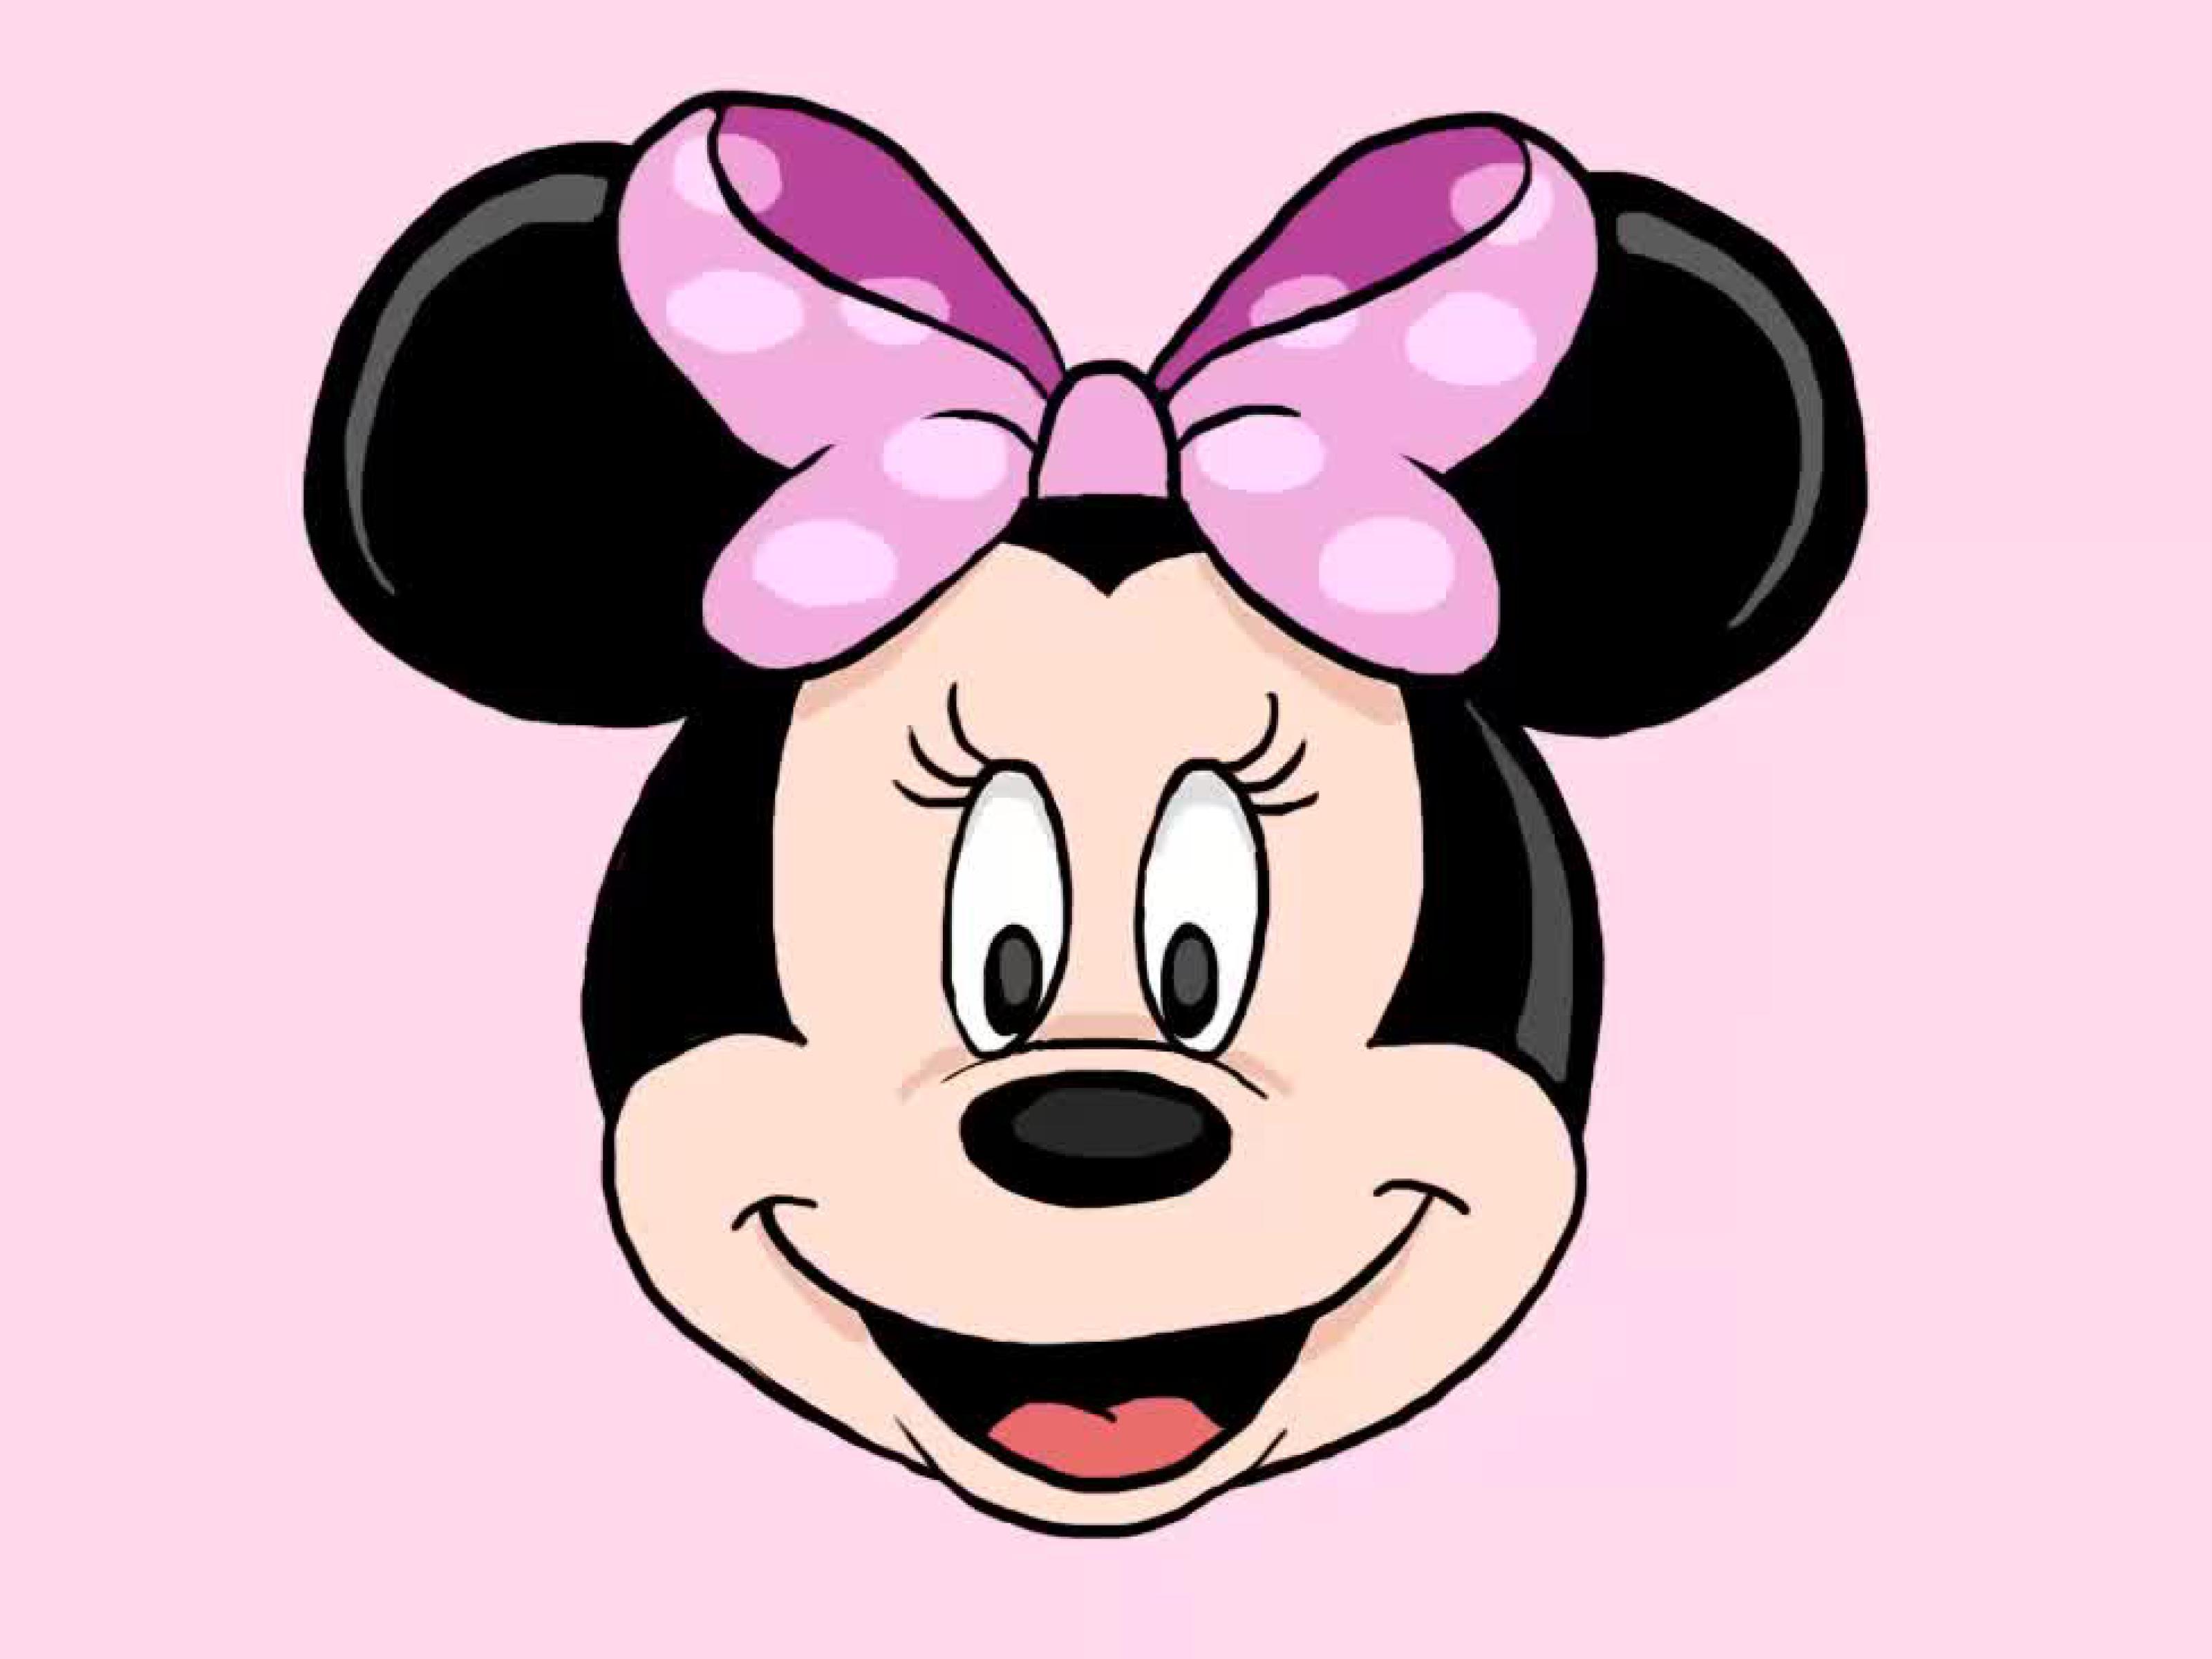 3 formas de dibujar a Minnie Mouse - wikiHow